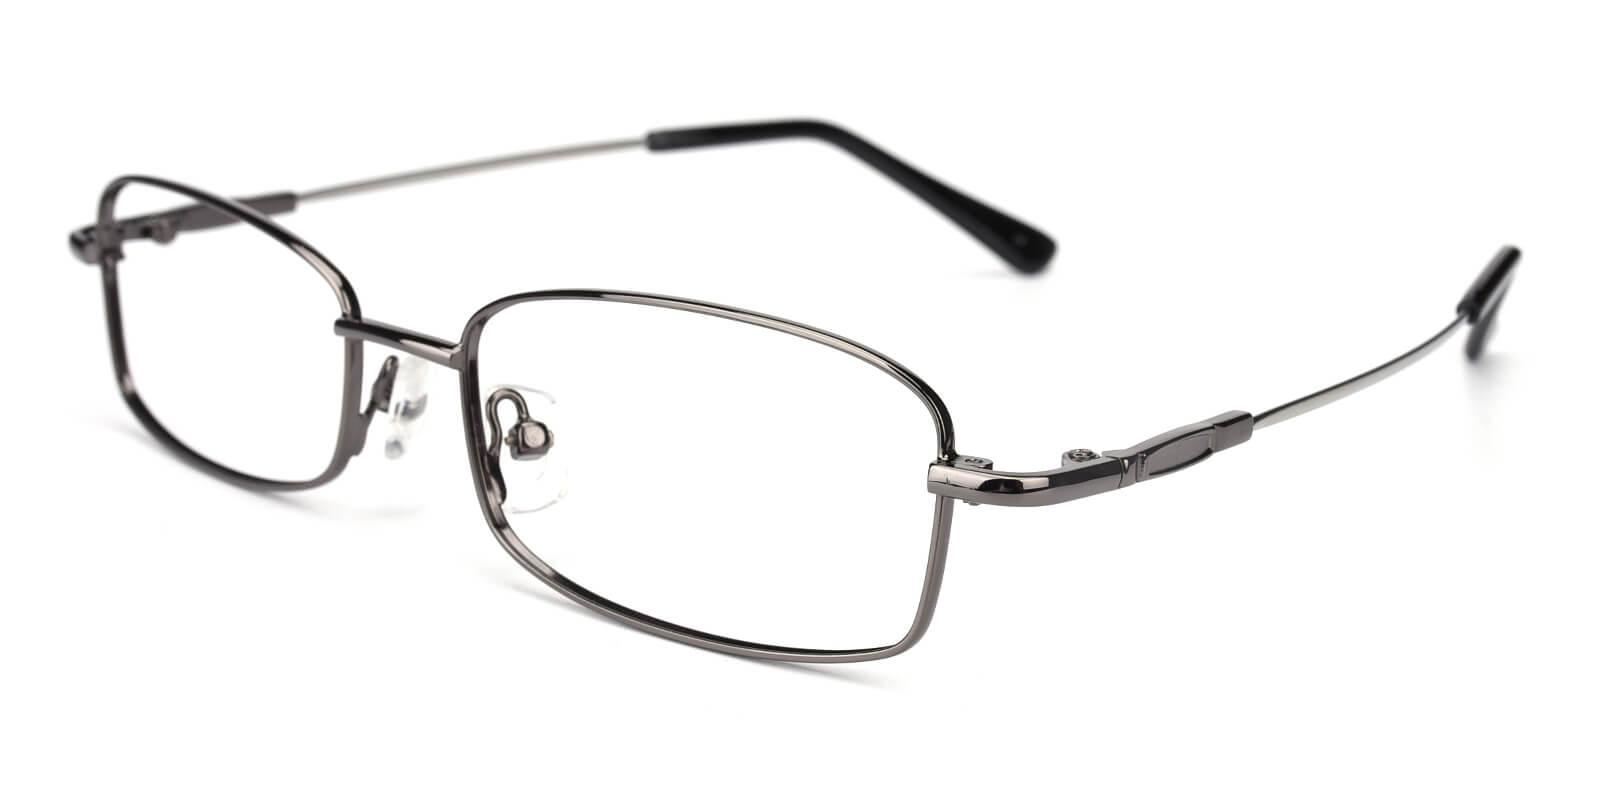 Isha-Gun-Rectangle-Metal-Eyeglasses-additional1